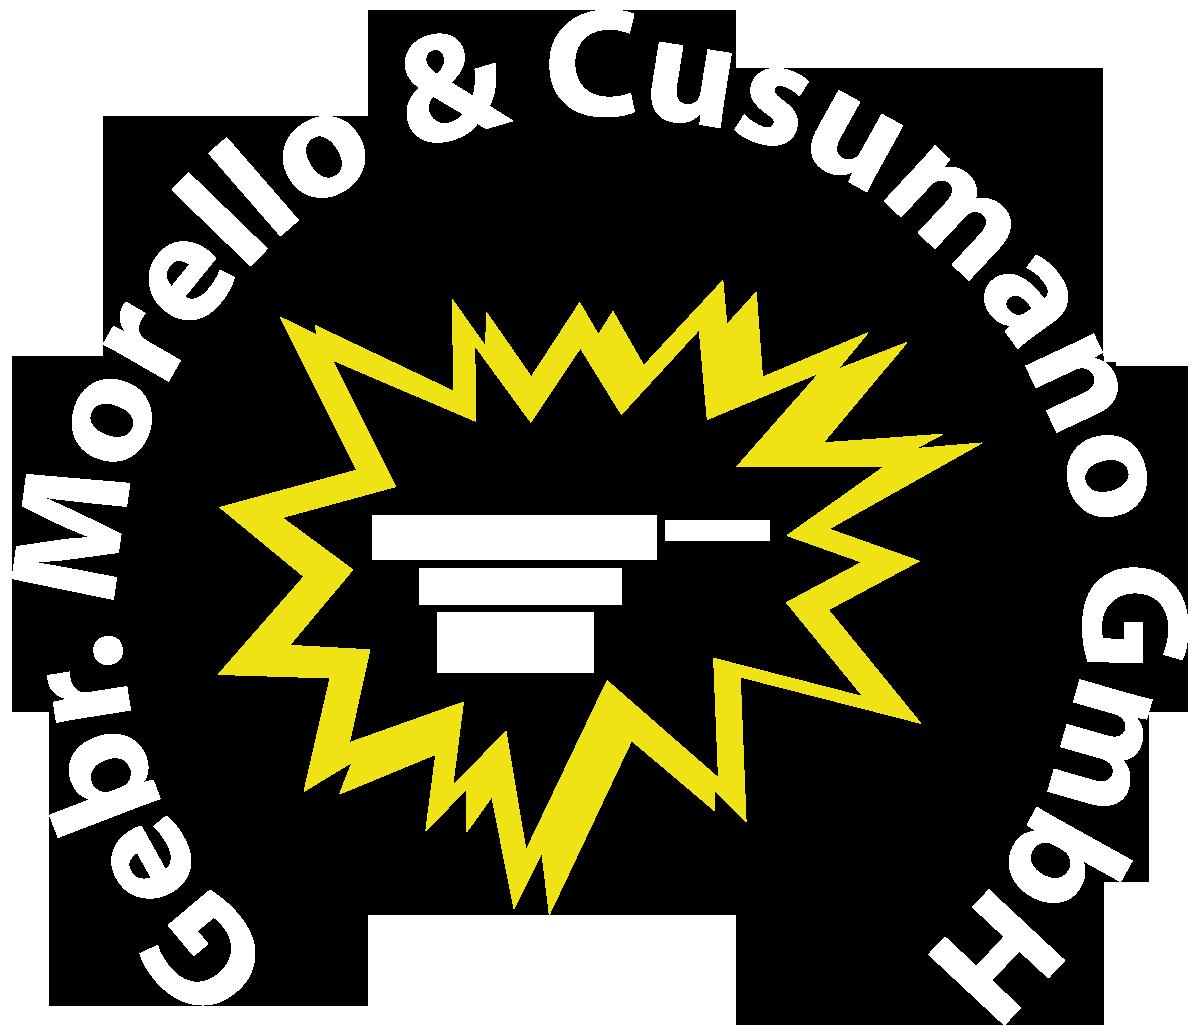 Gebr. Morello & Cusumano GmbH